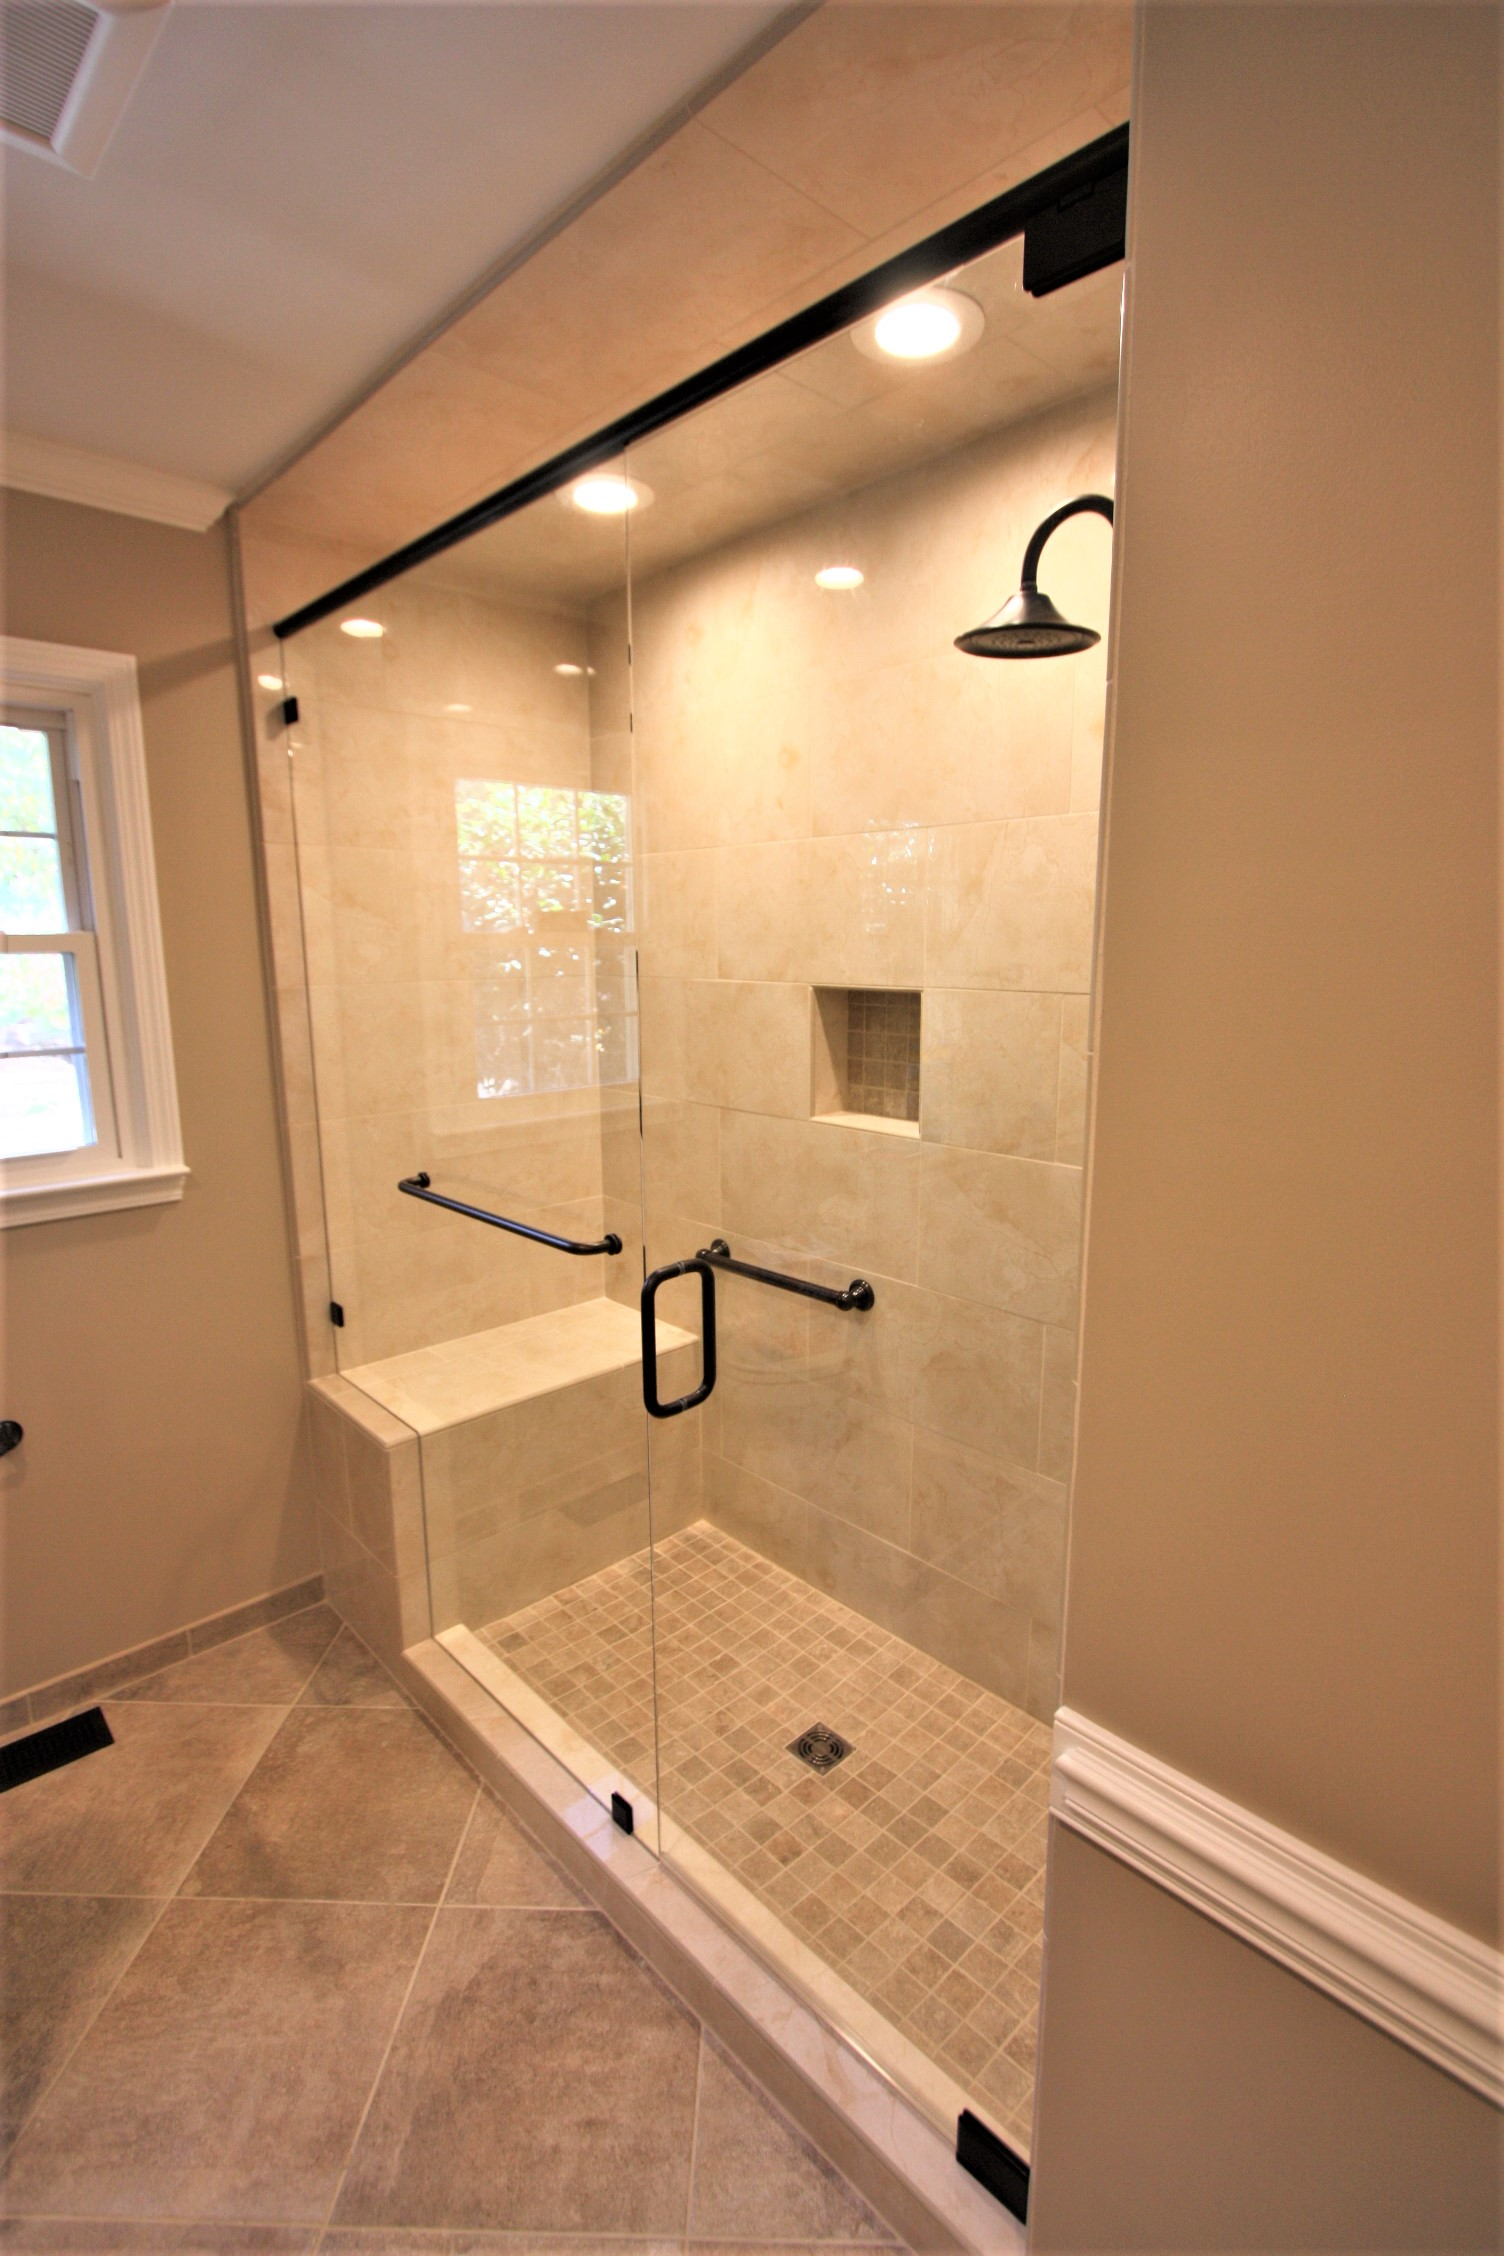 McNeill Bathrooms